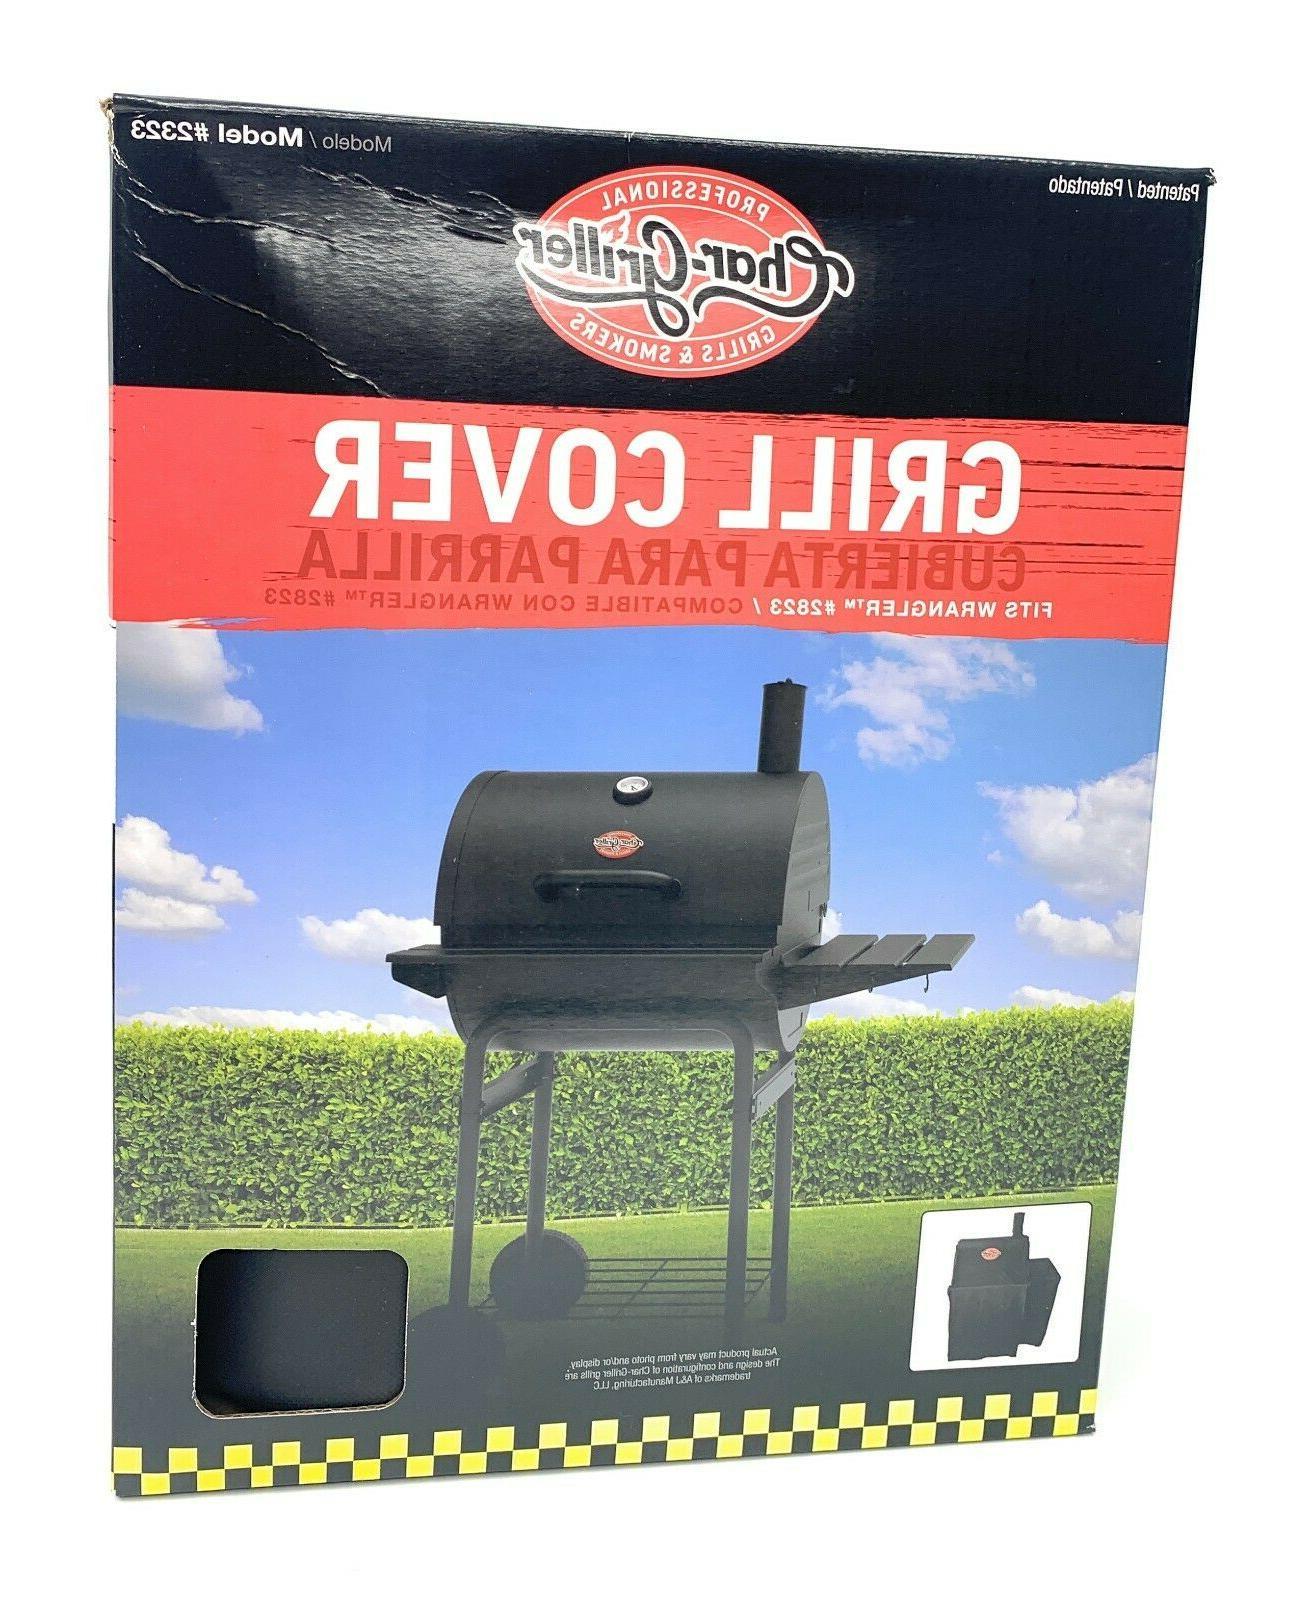 wrangler grill smoker cover